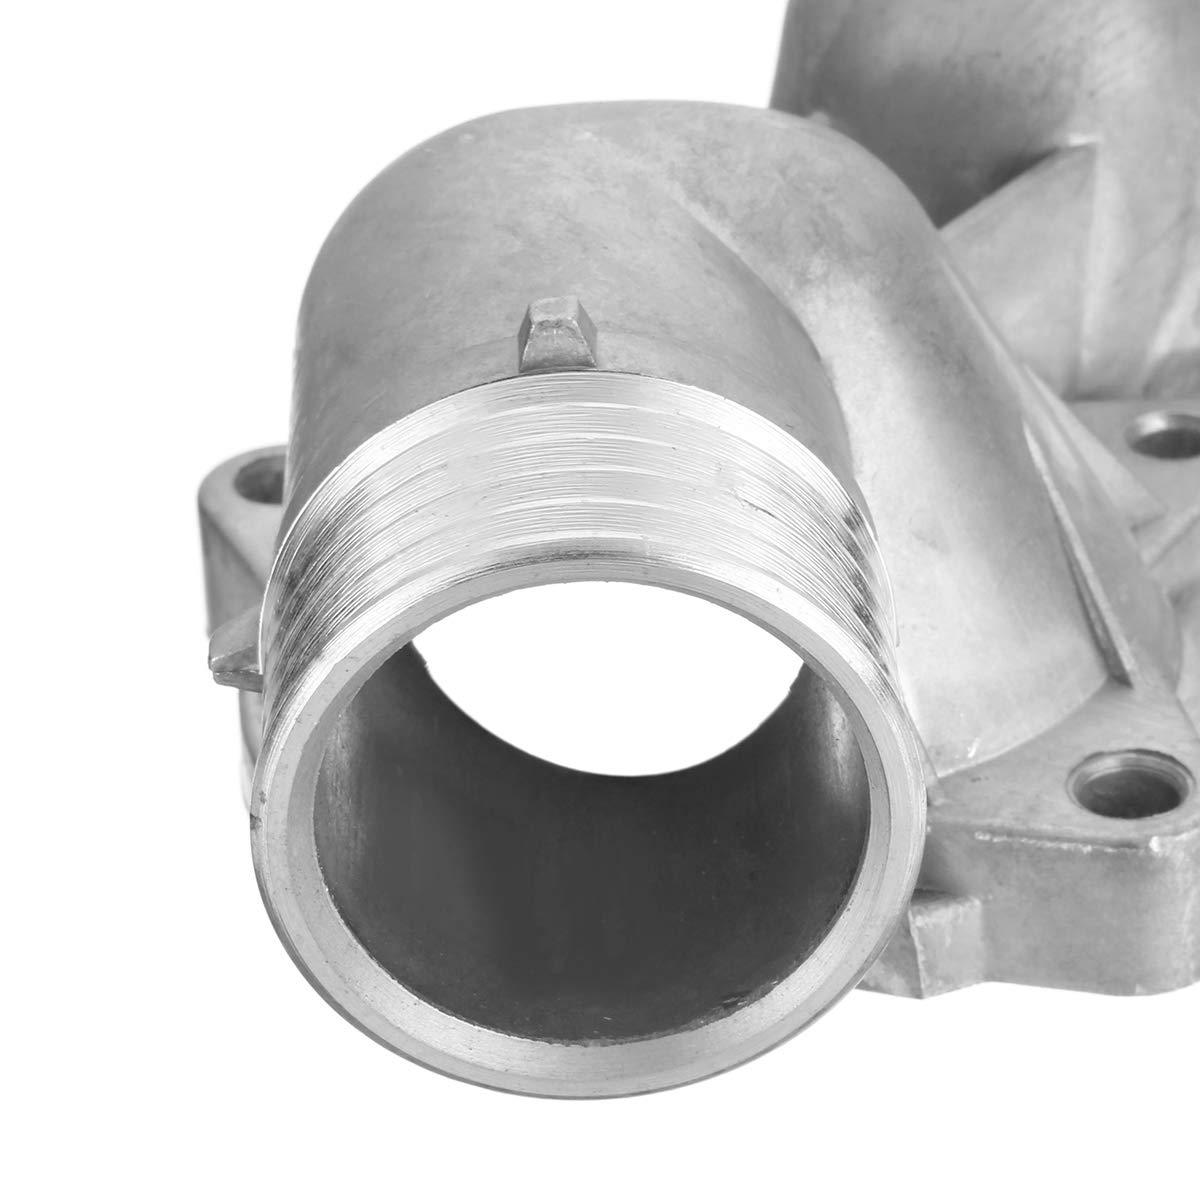 WOVELOT Automotive Aluminum Thermostat Housing For E39 528I 1997 1998 11531740478